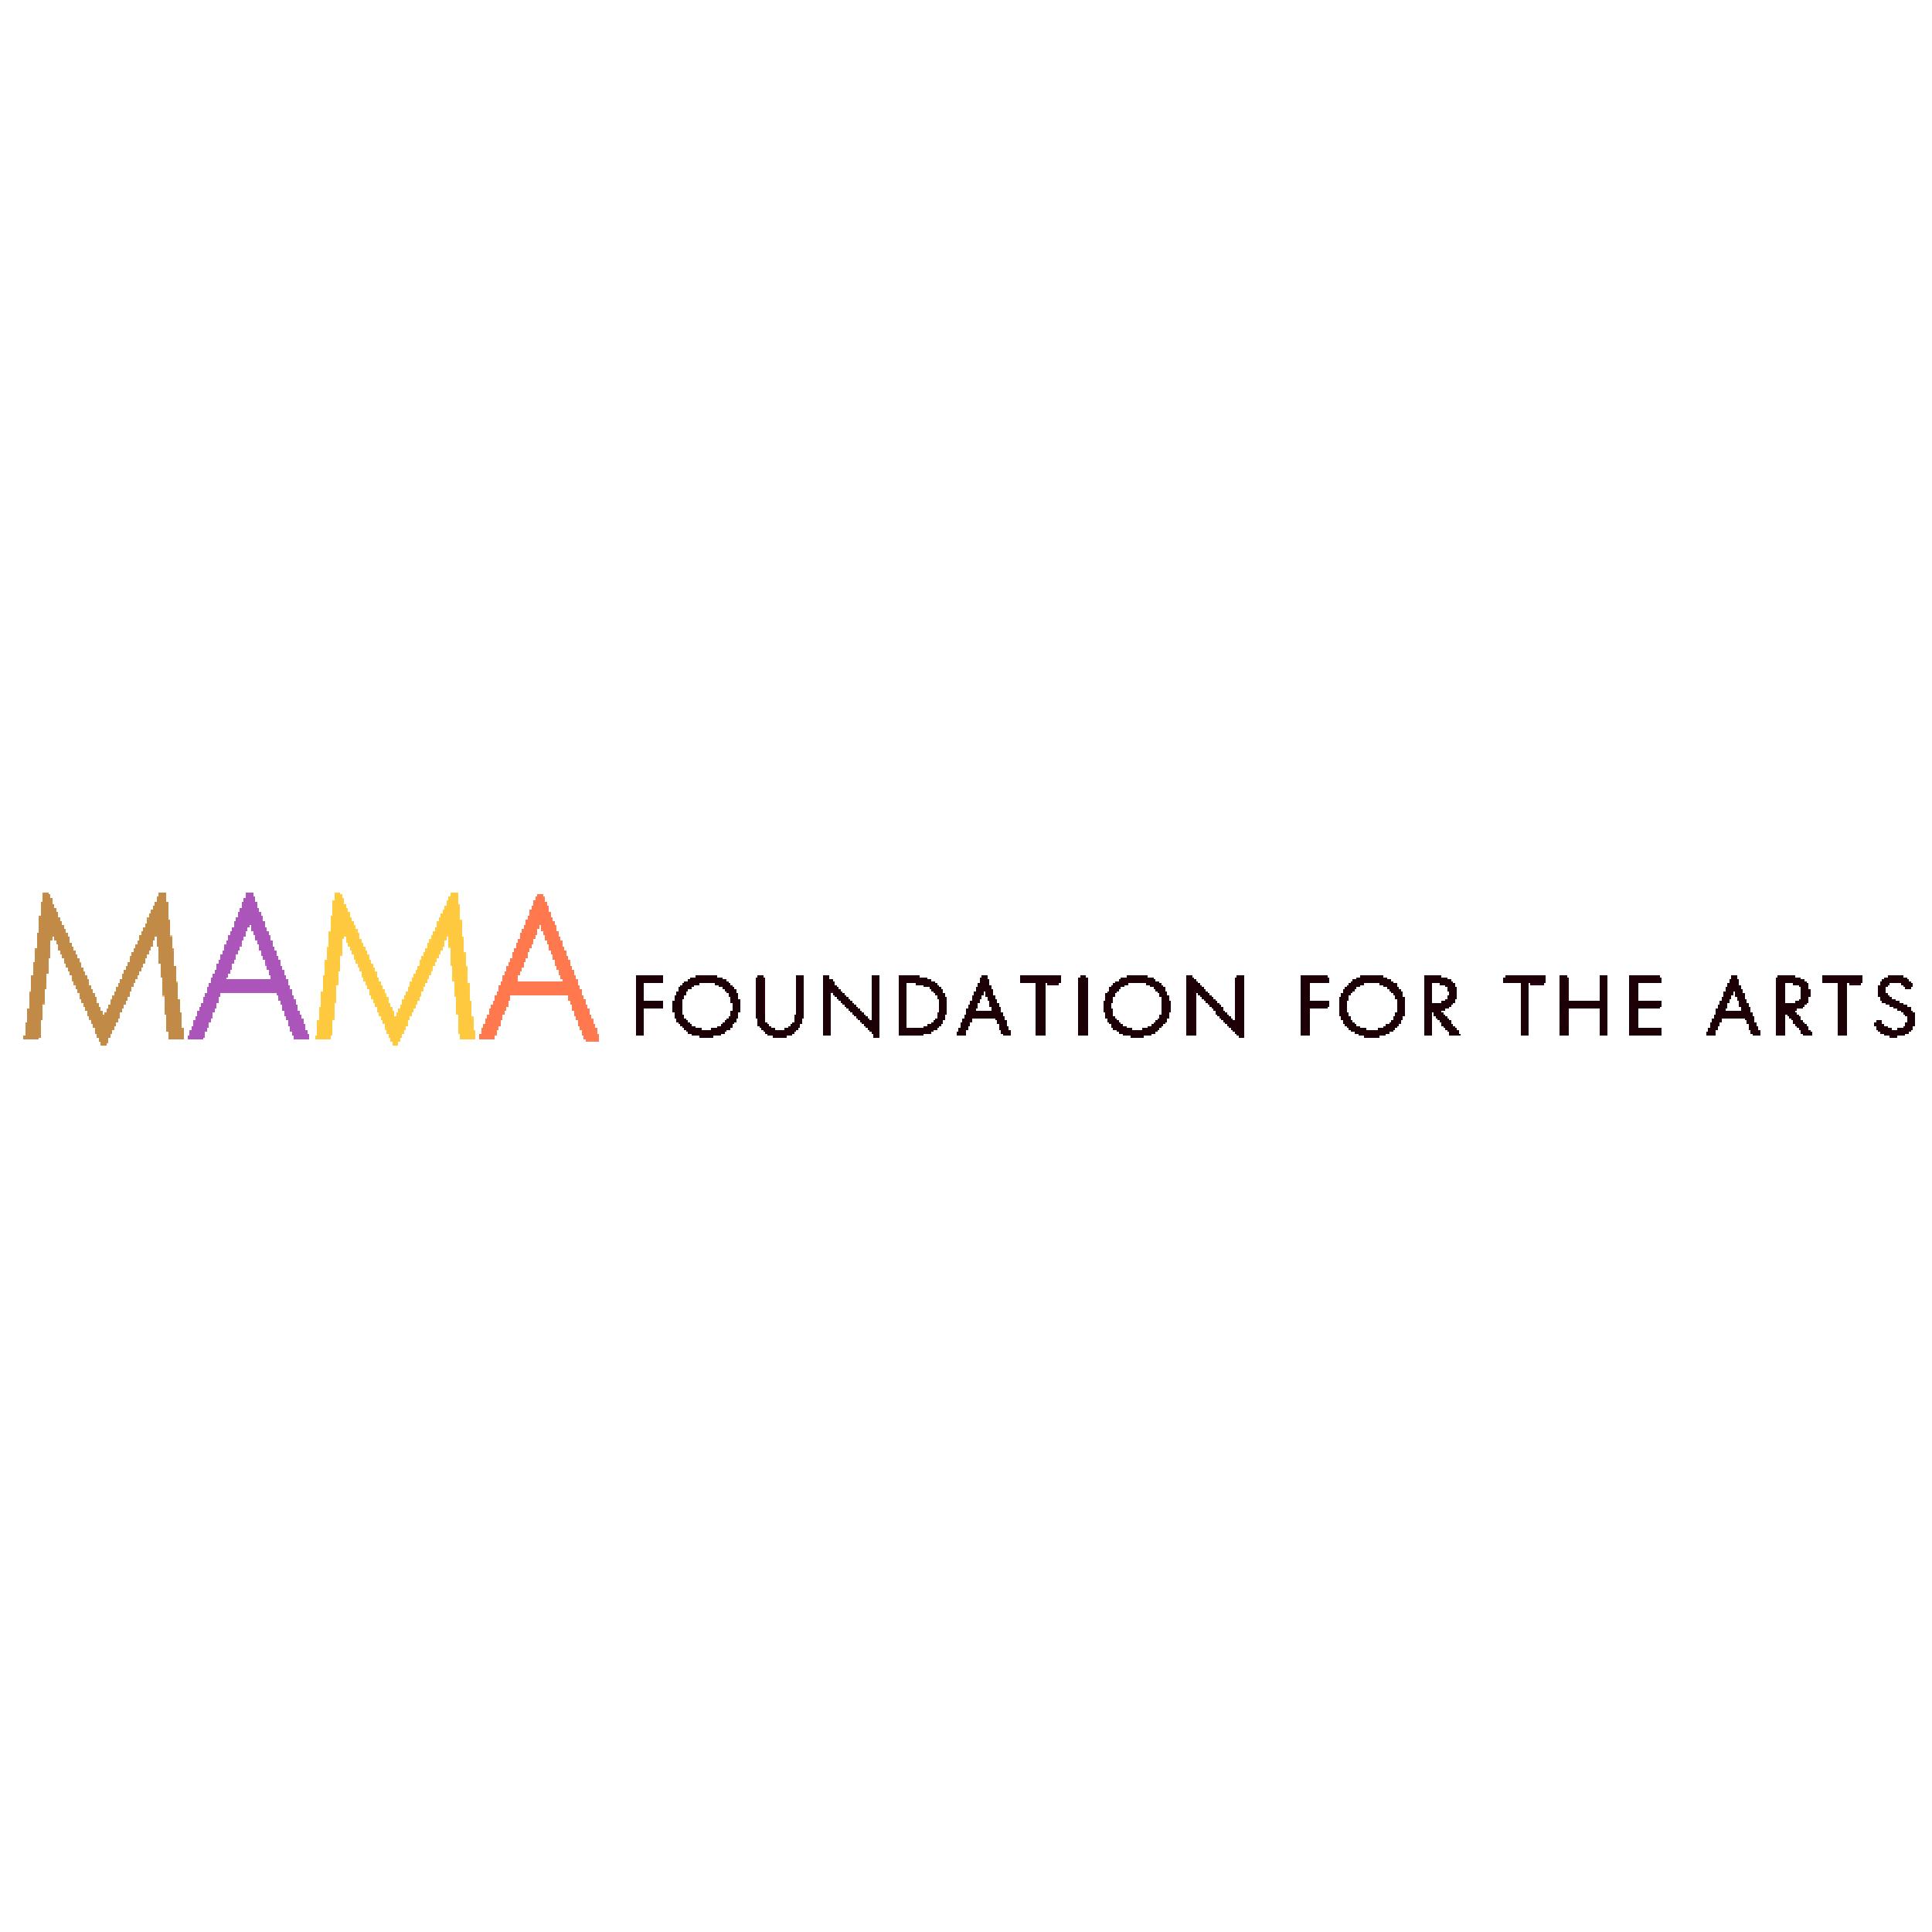 MamaFoundation-01.png